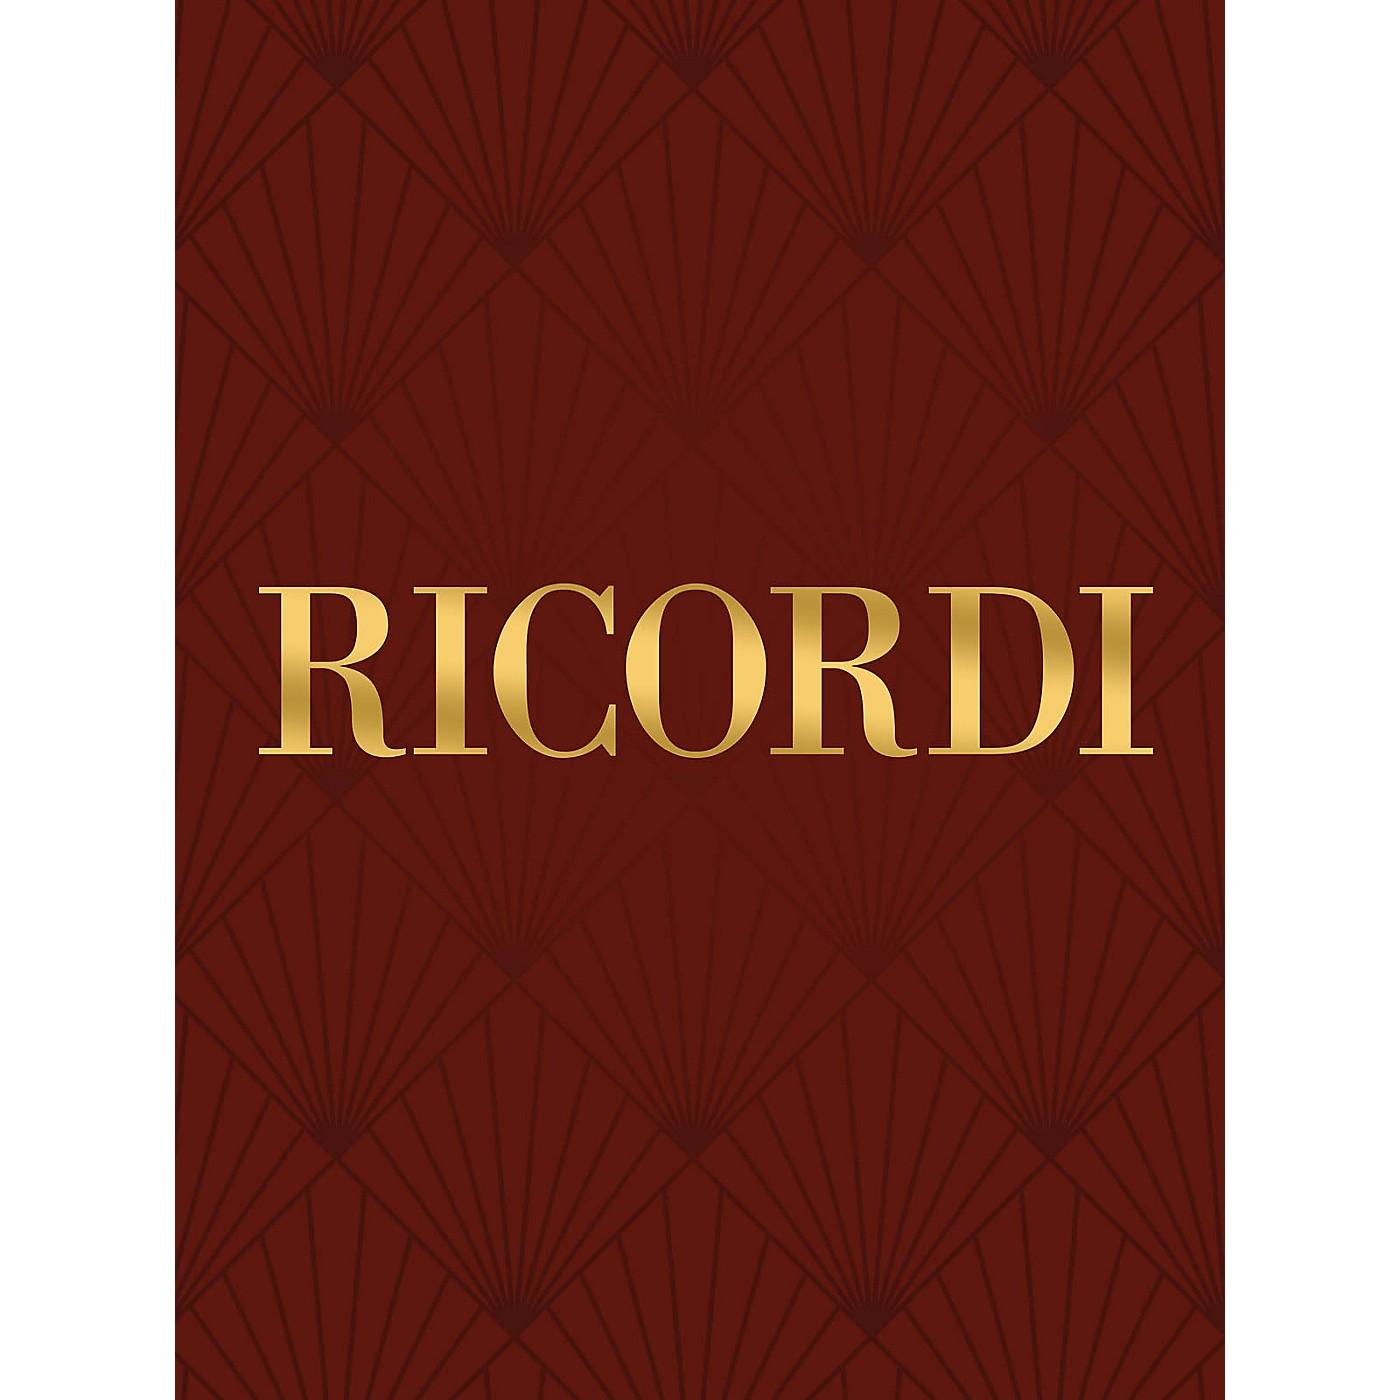 Ricordi La Technica del Violoncello (Left Hand) (Cello Method) String Method Series Composed by A Pais thumbnail